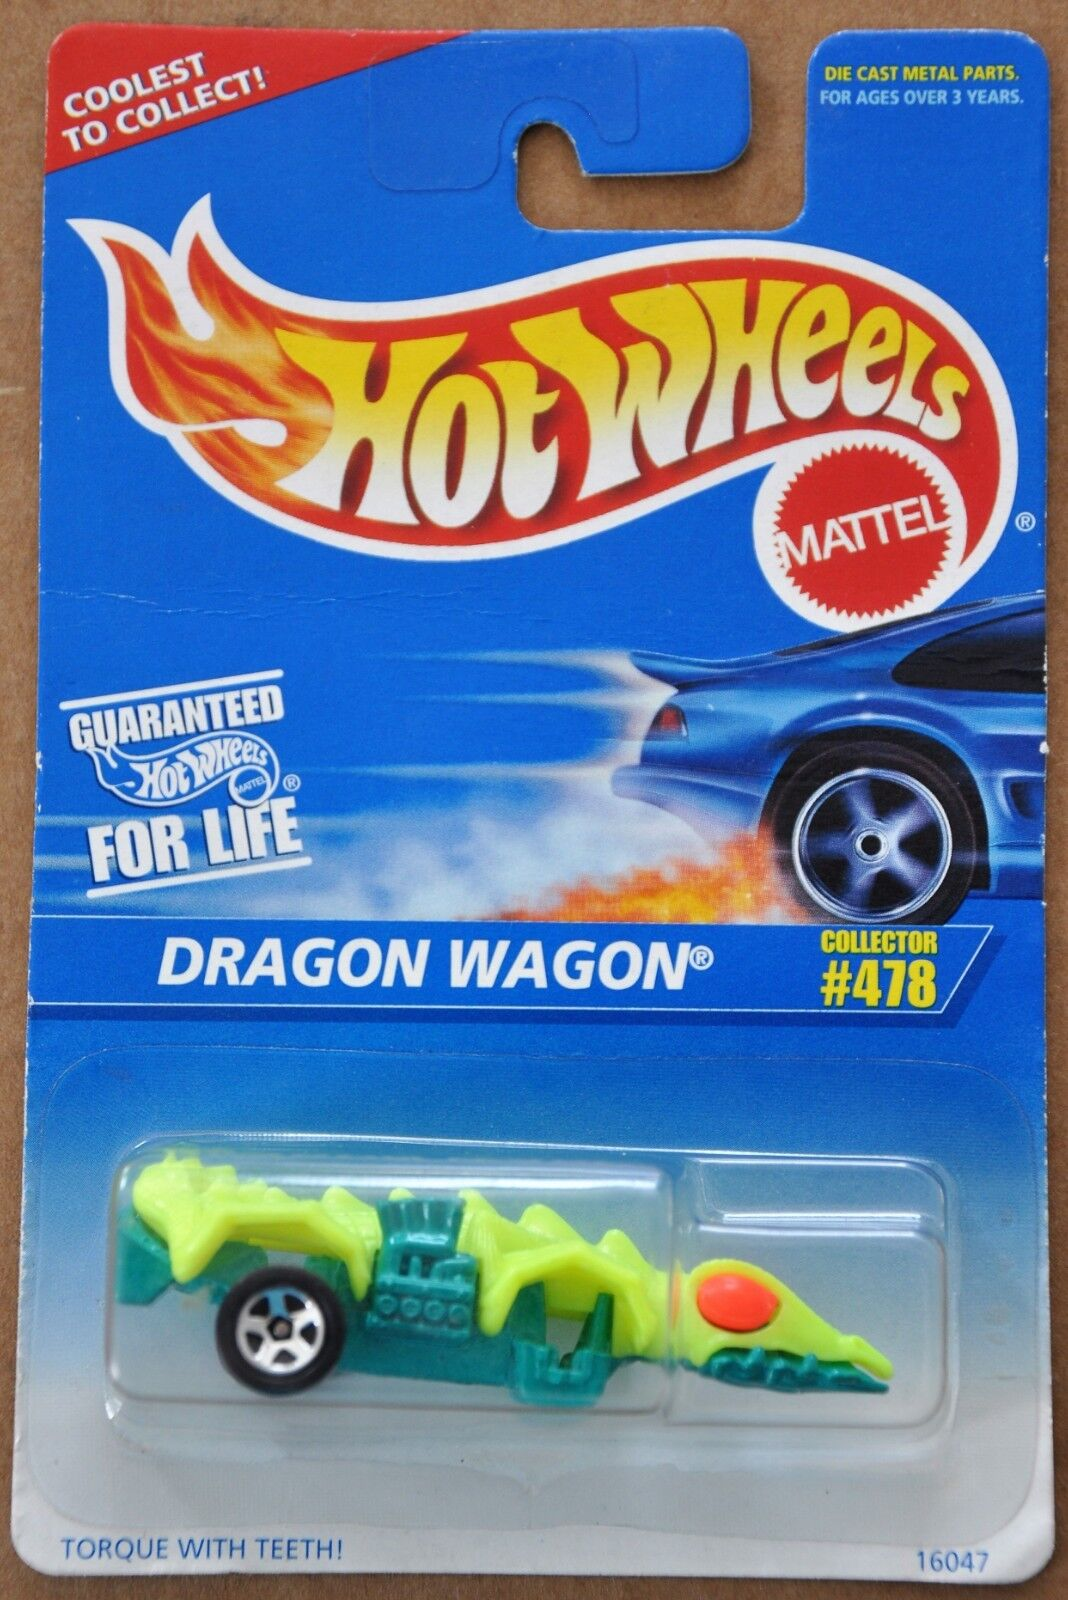 1996 Hot Wheels Dragon Wagon Collector ERROR MISSING WHEELS